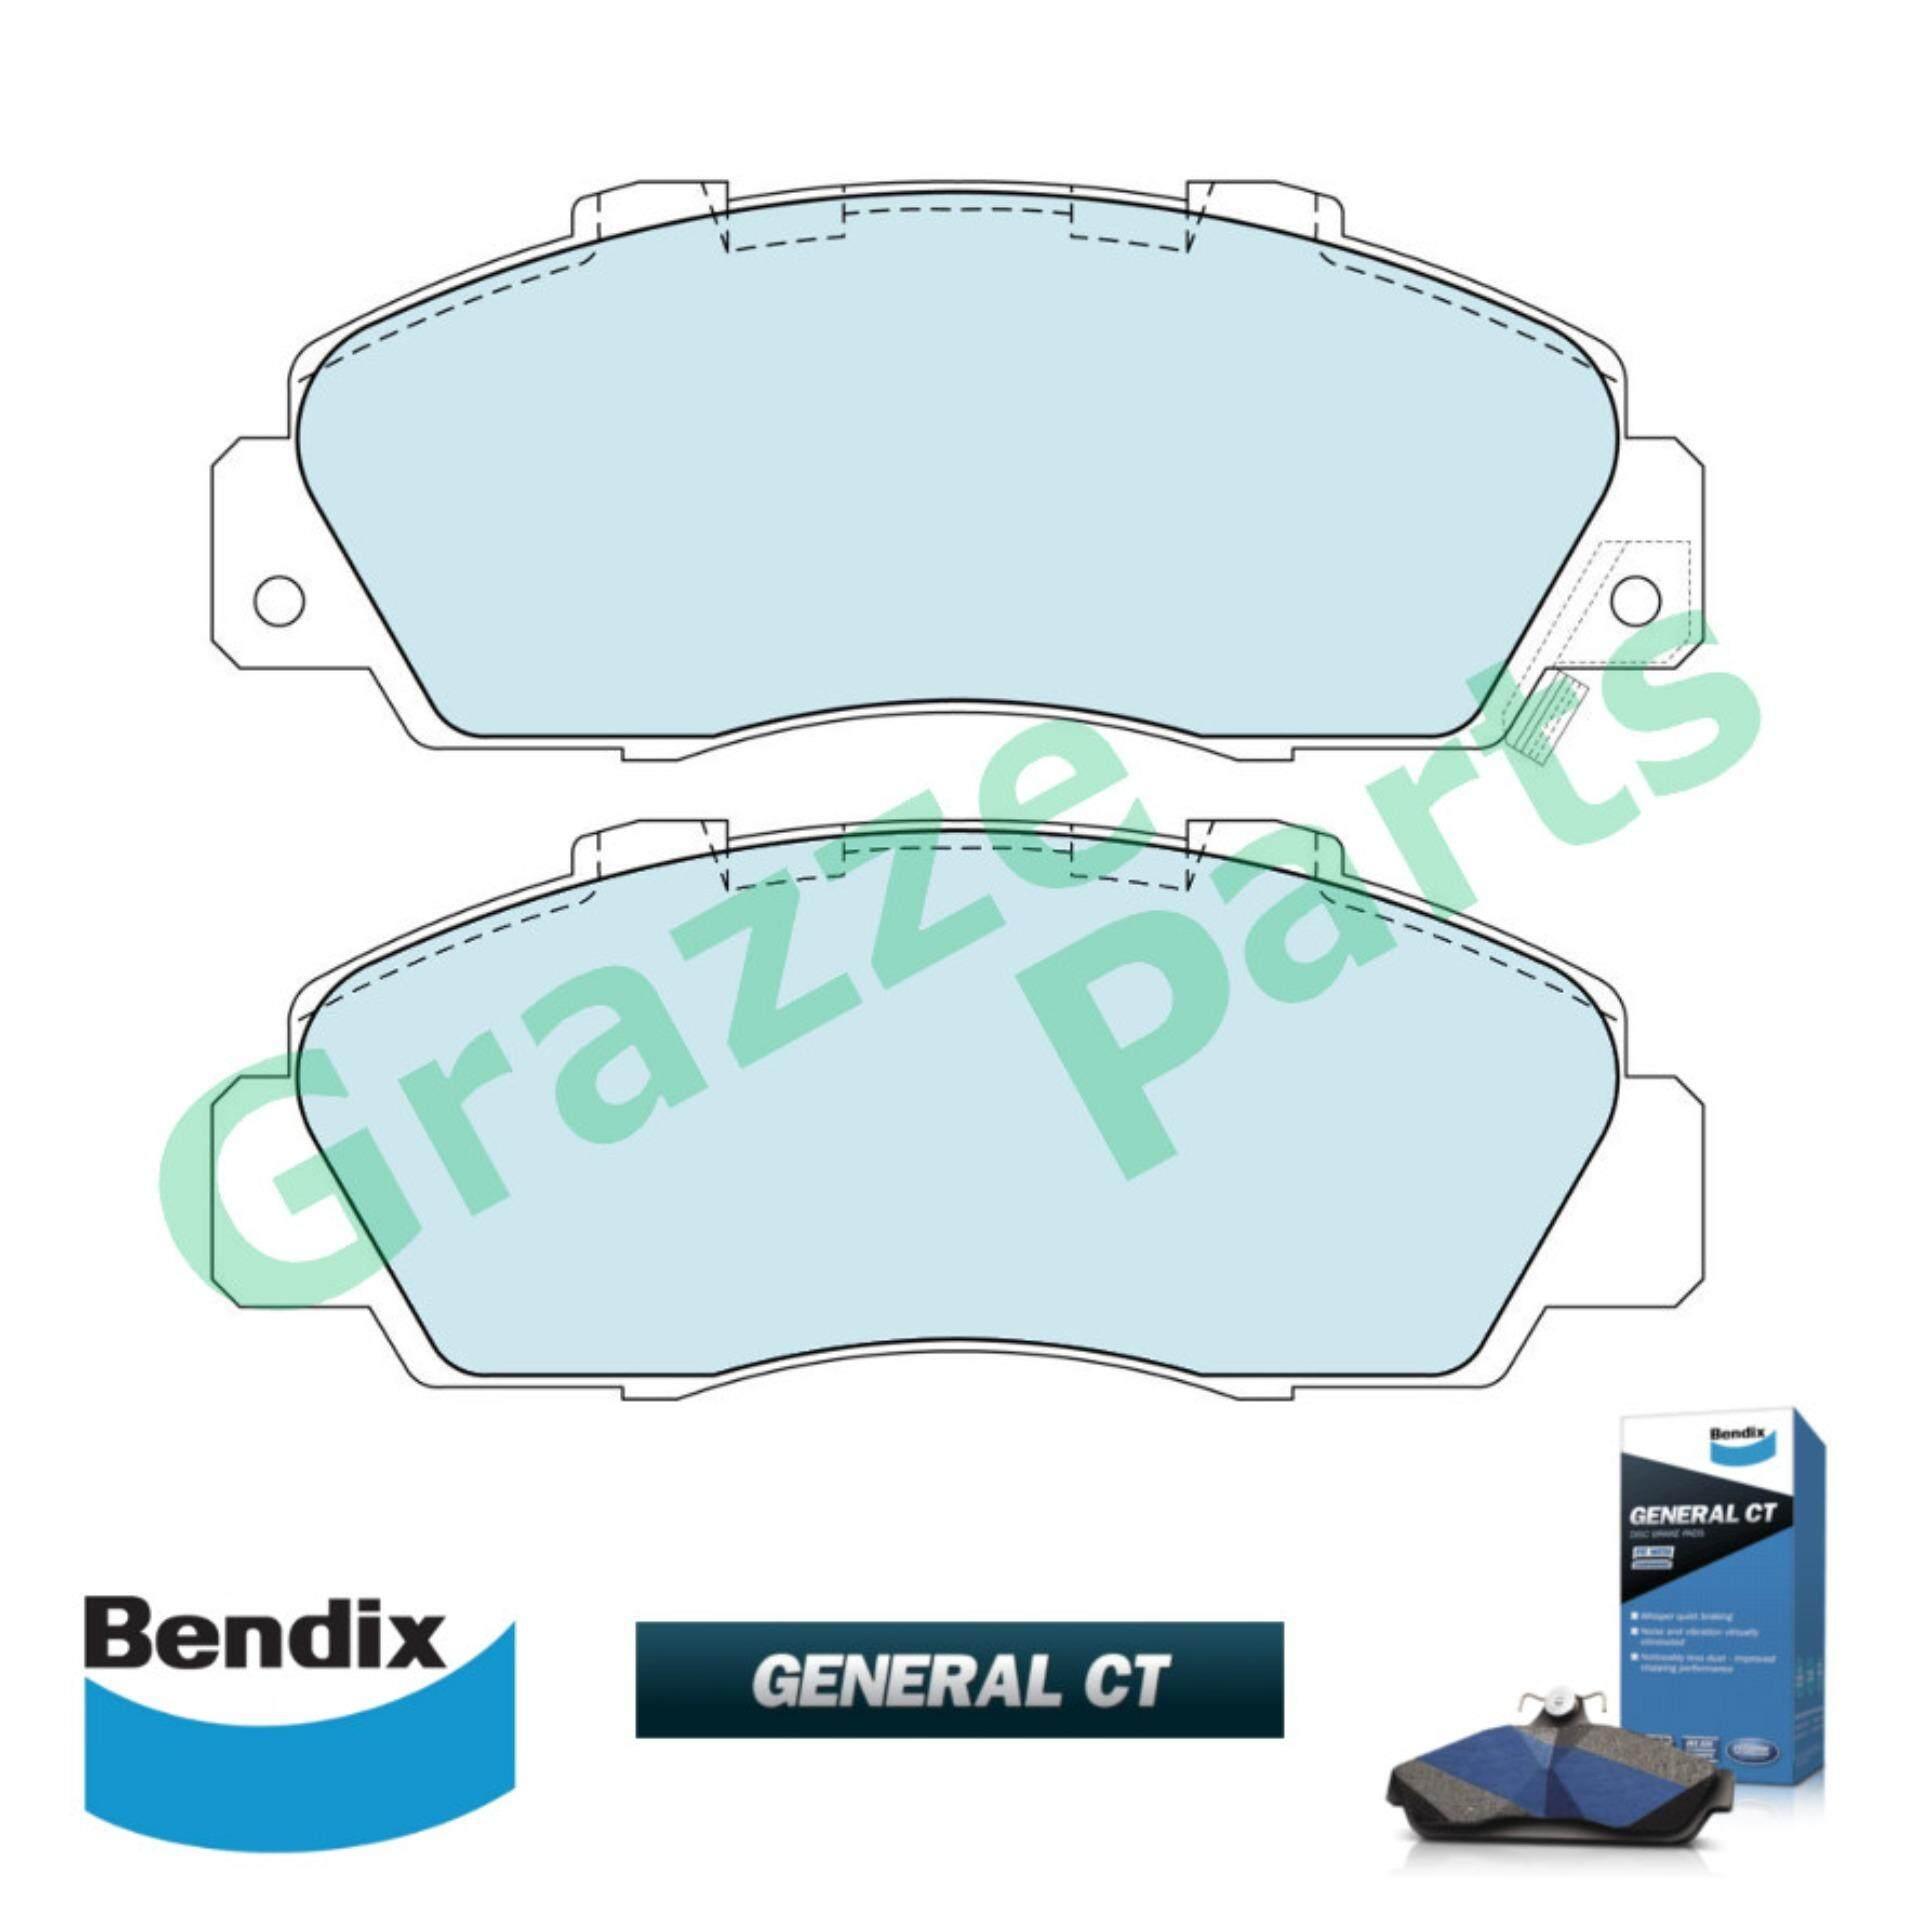 Bendix General CT Disc Brake Pad Front for DB1206 - Honda Accord SV4 NSX Prelude SSO Odyssey Legend Integra